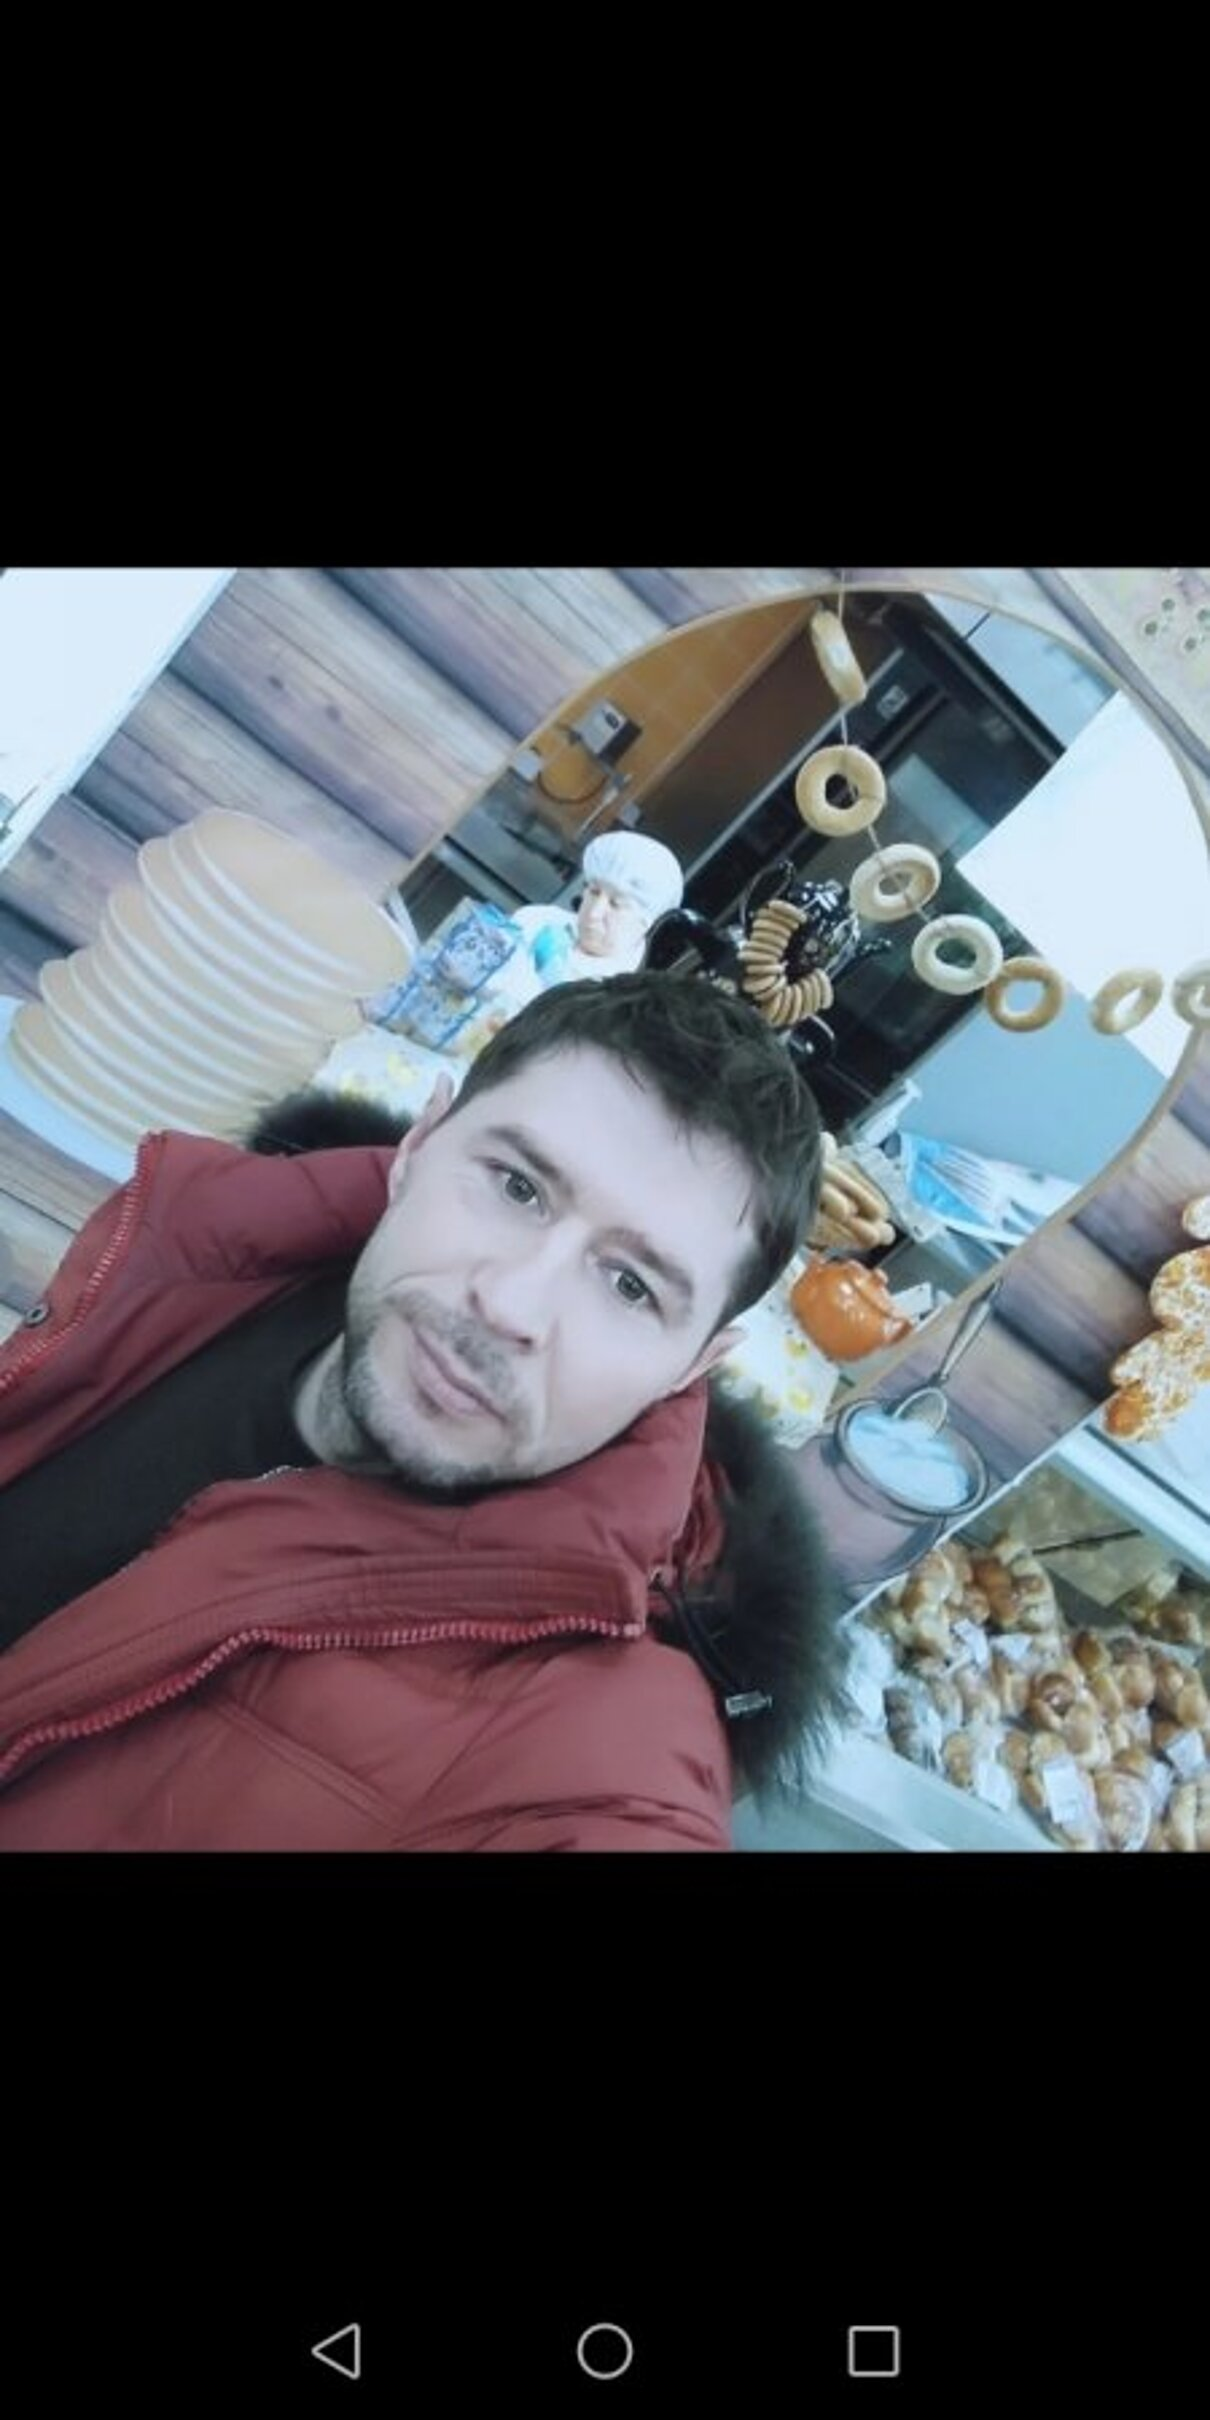 Жалоба-отзыв: Батыр Муханов - Патологический врун, пикапер